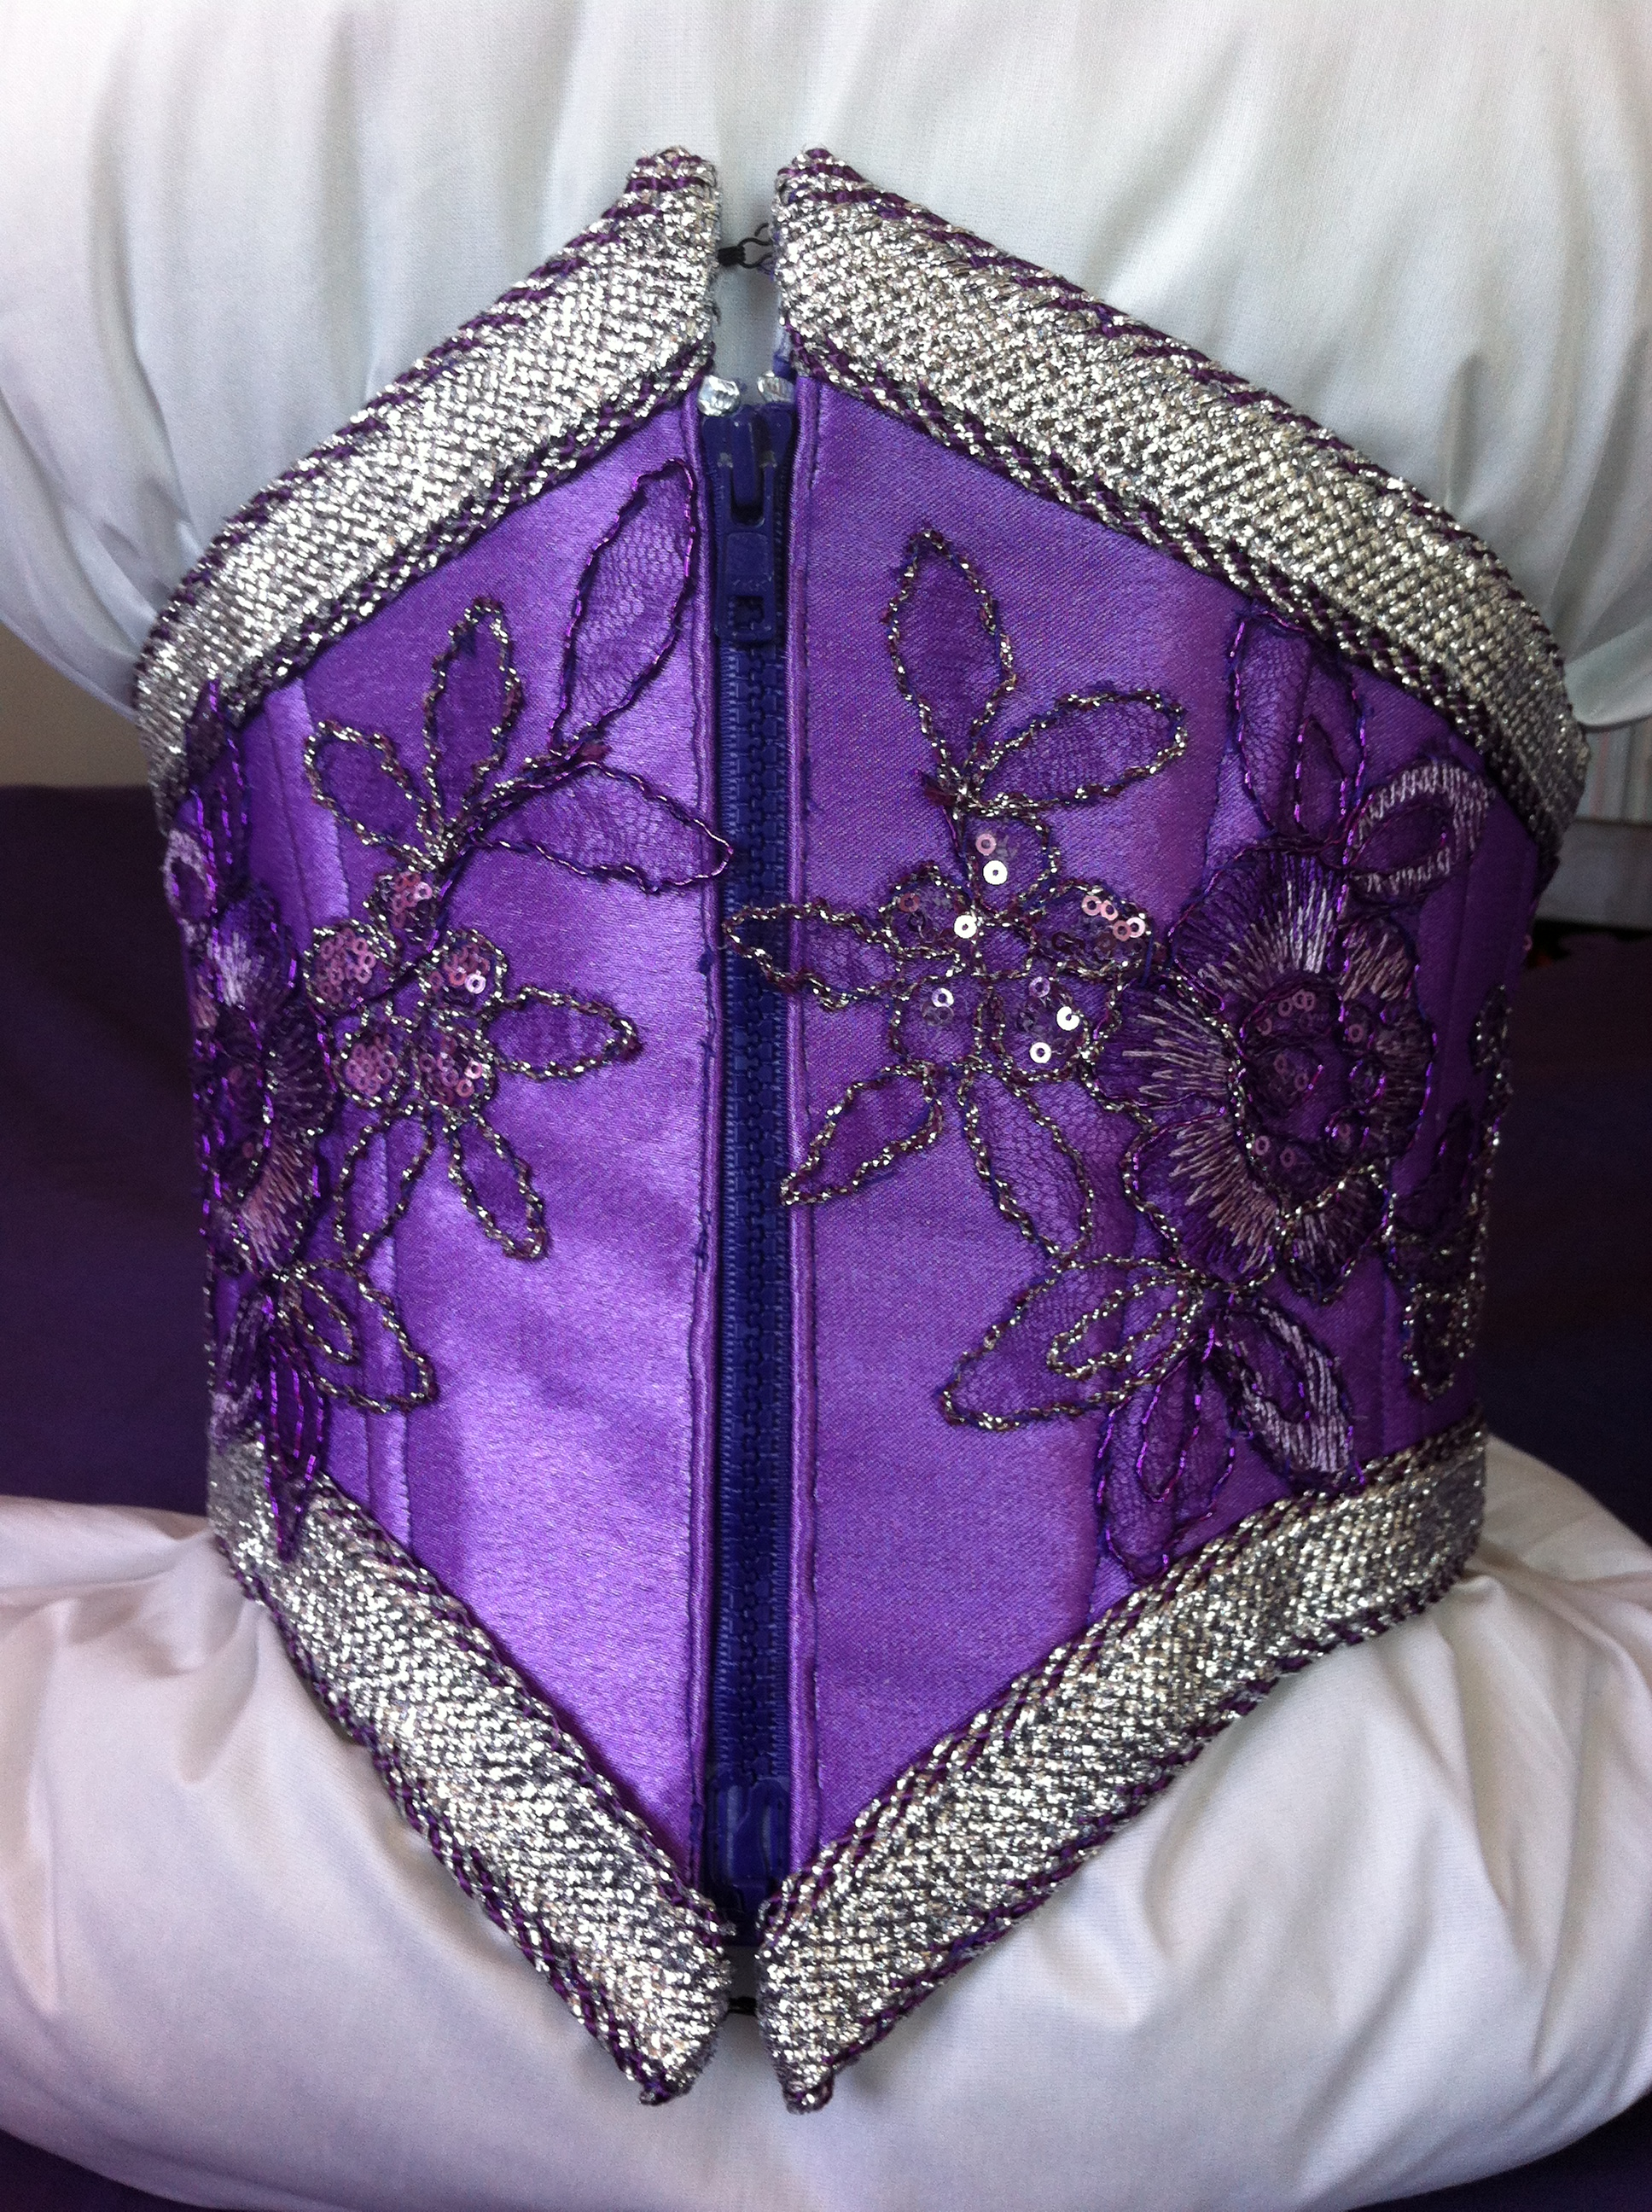 Serrage ceinture corset 1